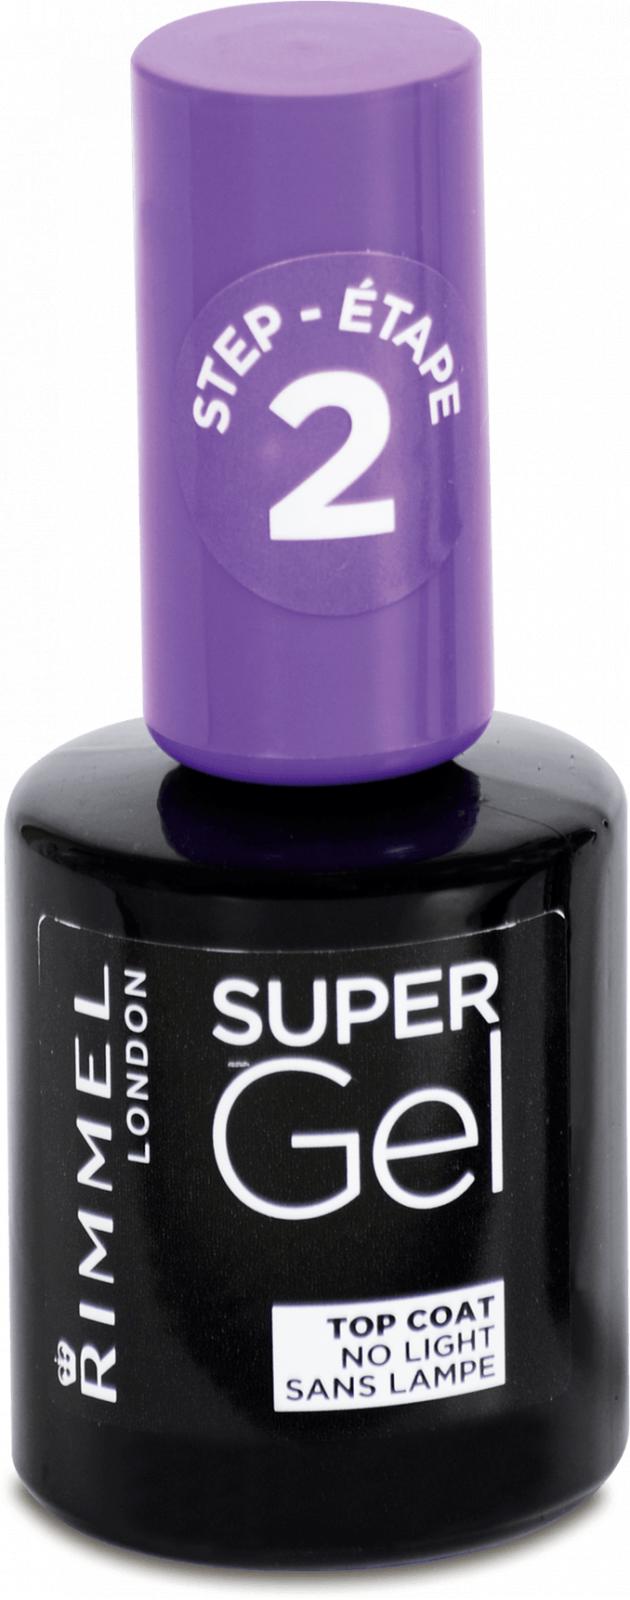 Rimmel Super Gel Top Coat 12 Ml Od 110 Kc Zbozi Cz